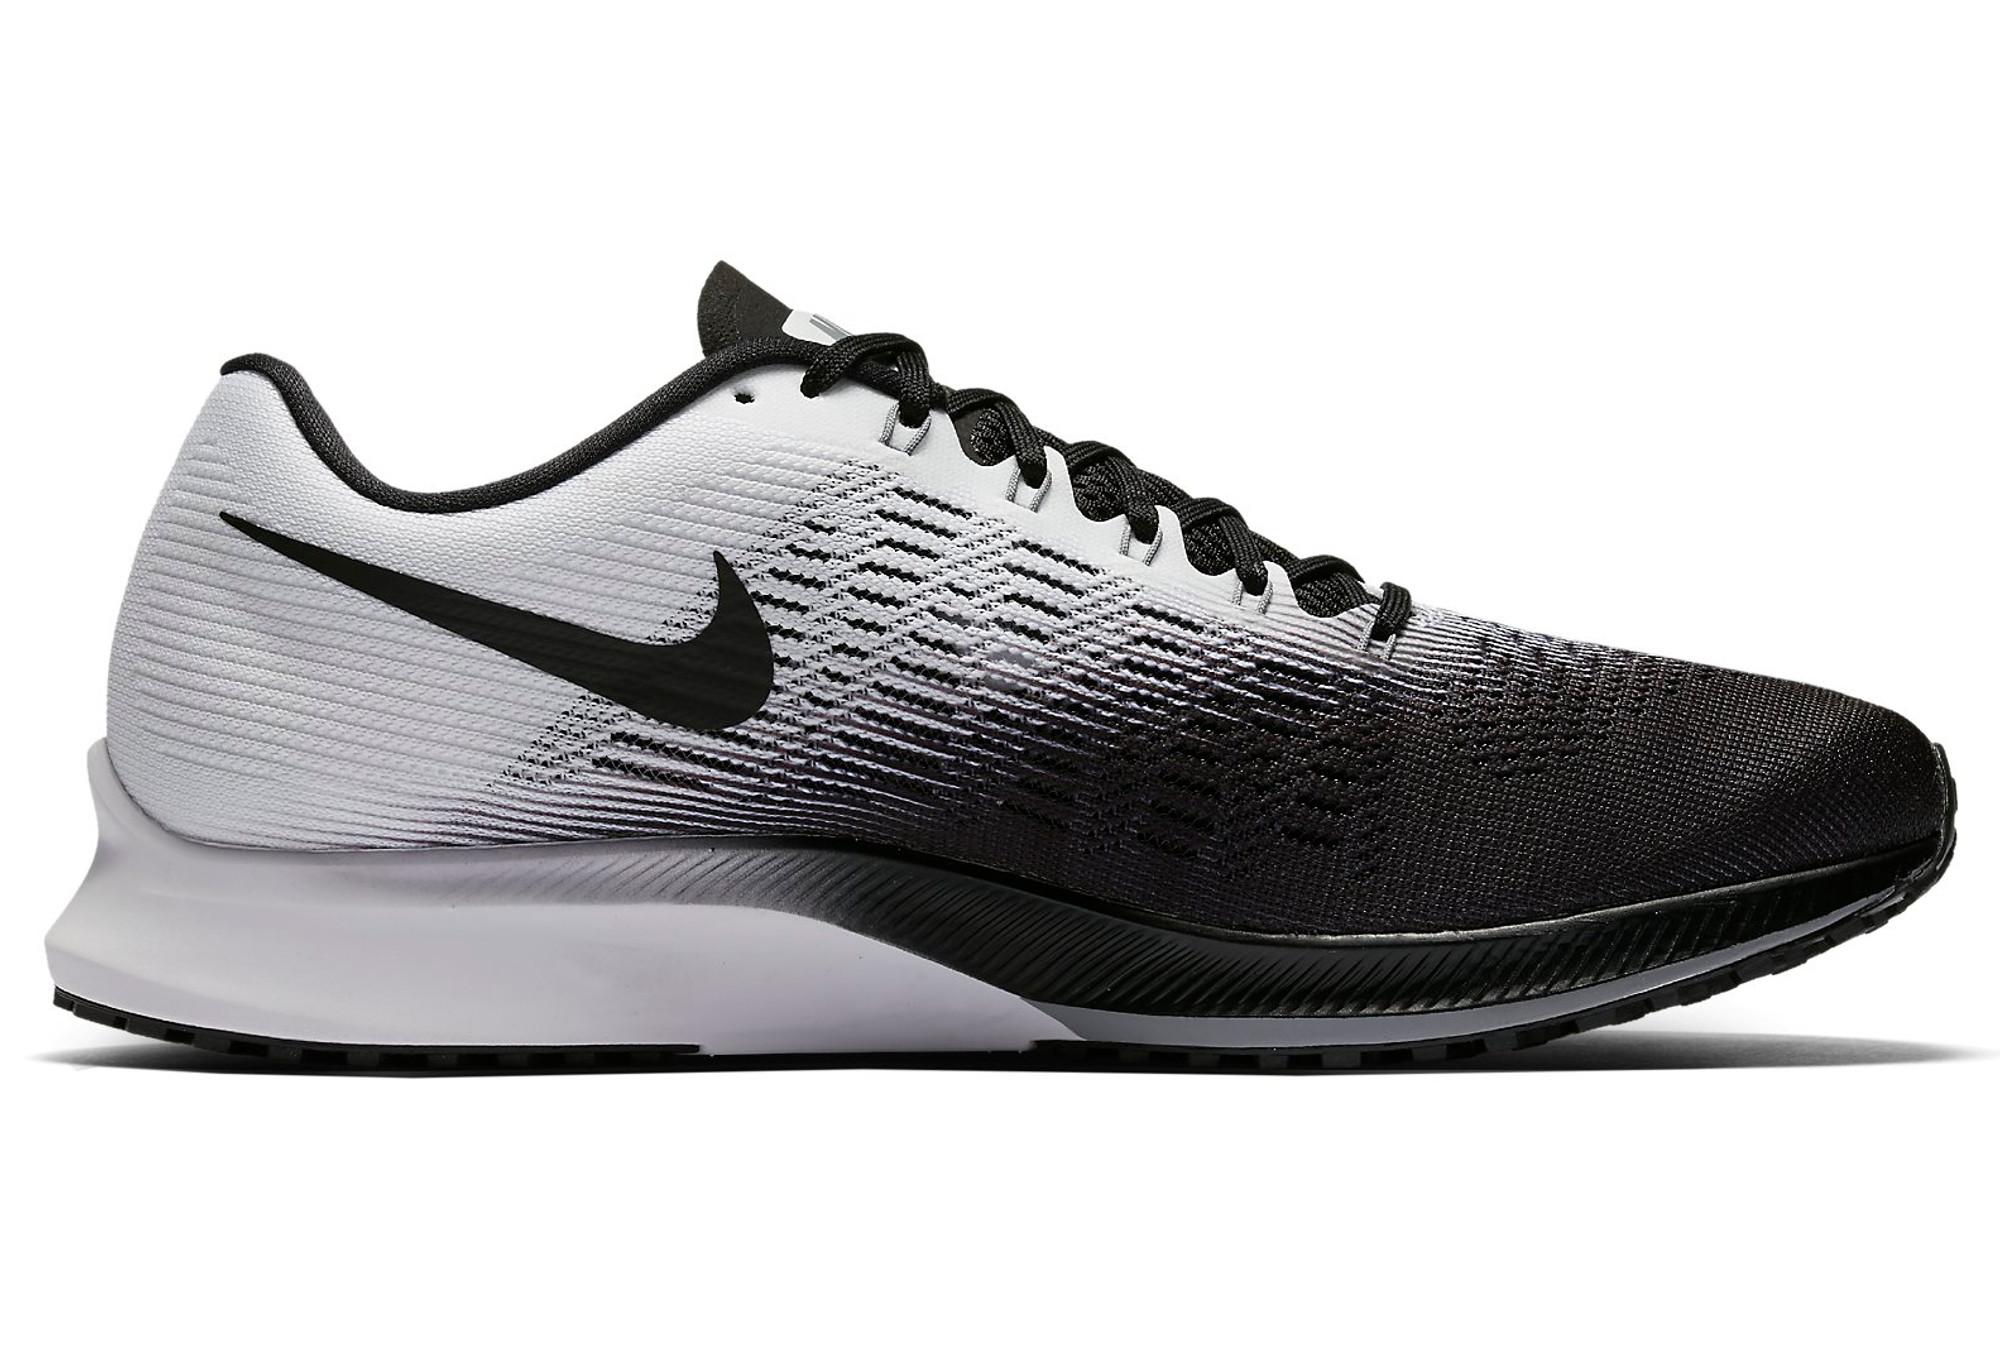 Nike Air Zoom Elite 9, Chaussures de Running Femme, Noir (Black/White-Cool Grey 001), 38 EU